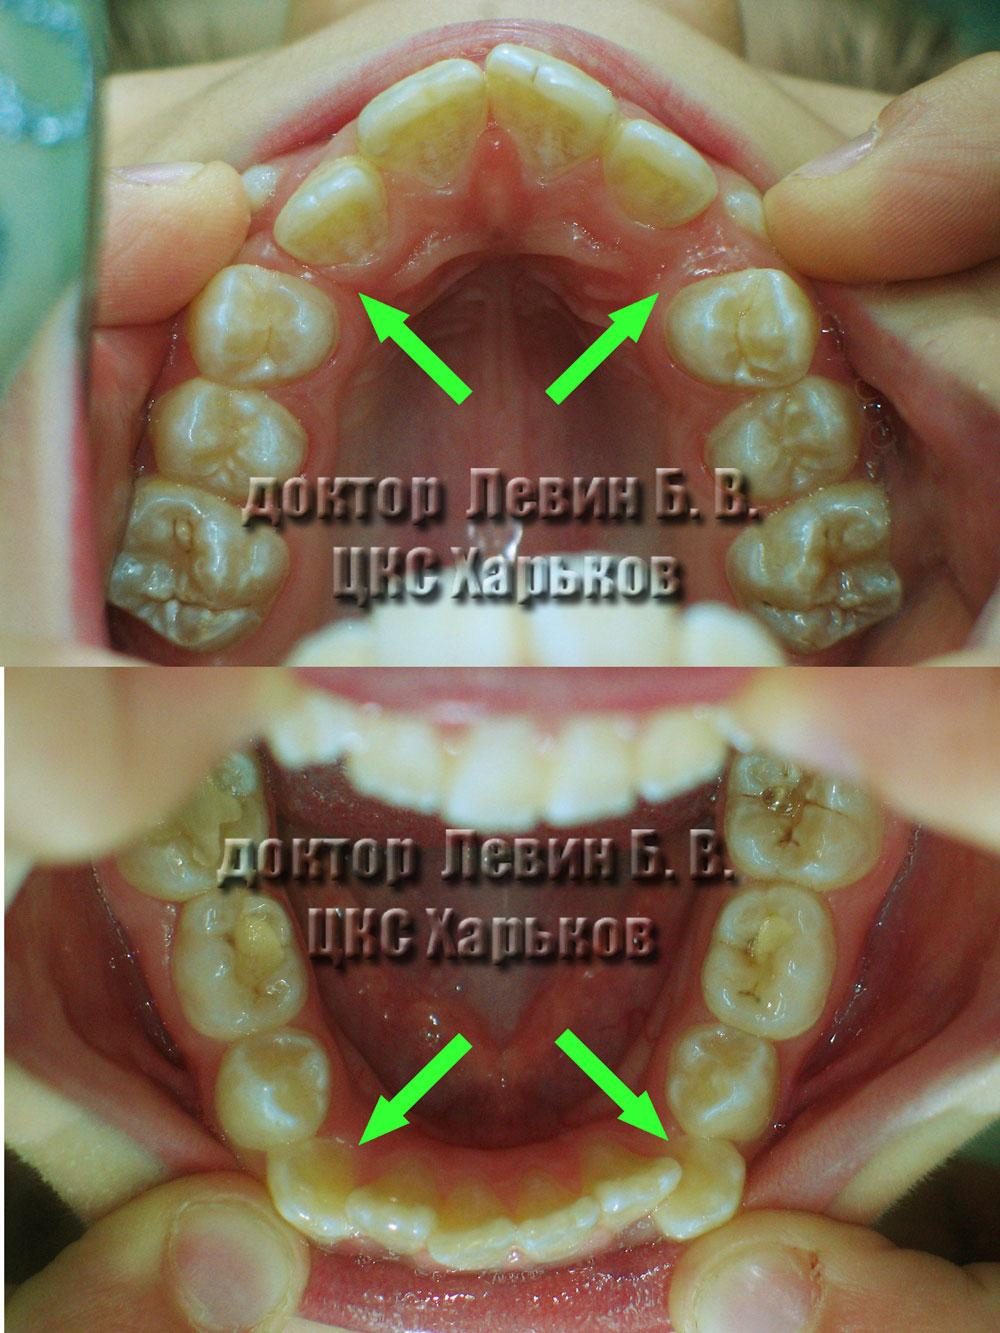 дефицит места зубного ряда до лечения брекетами